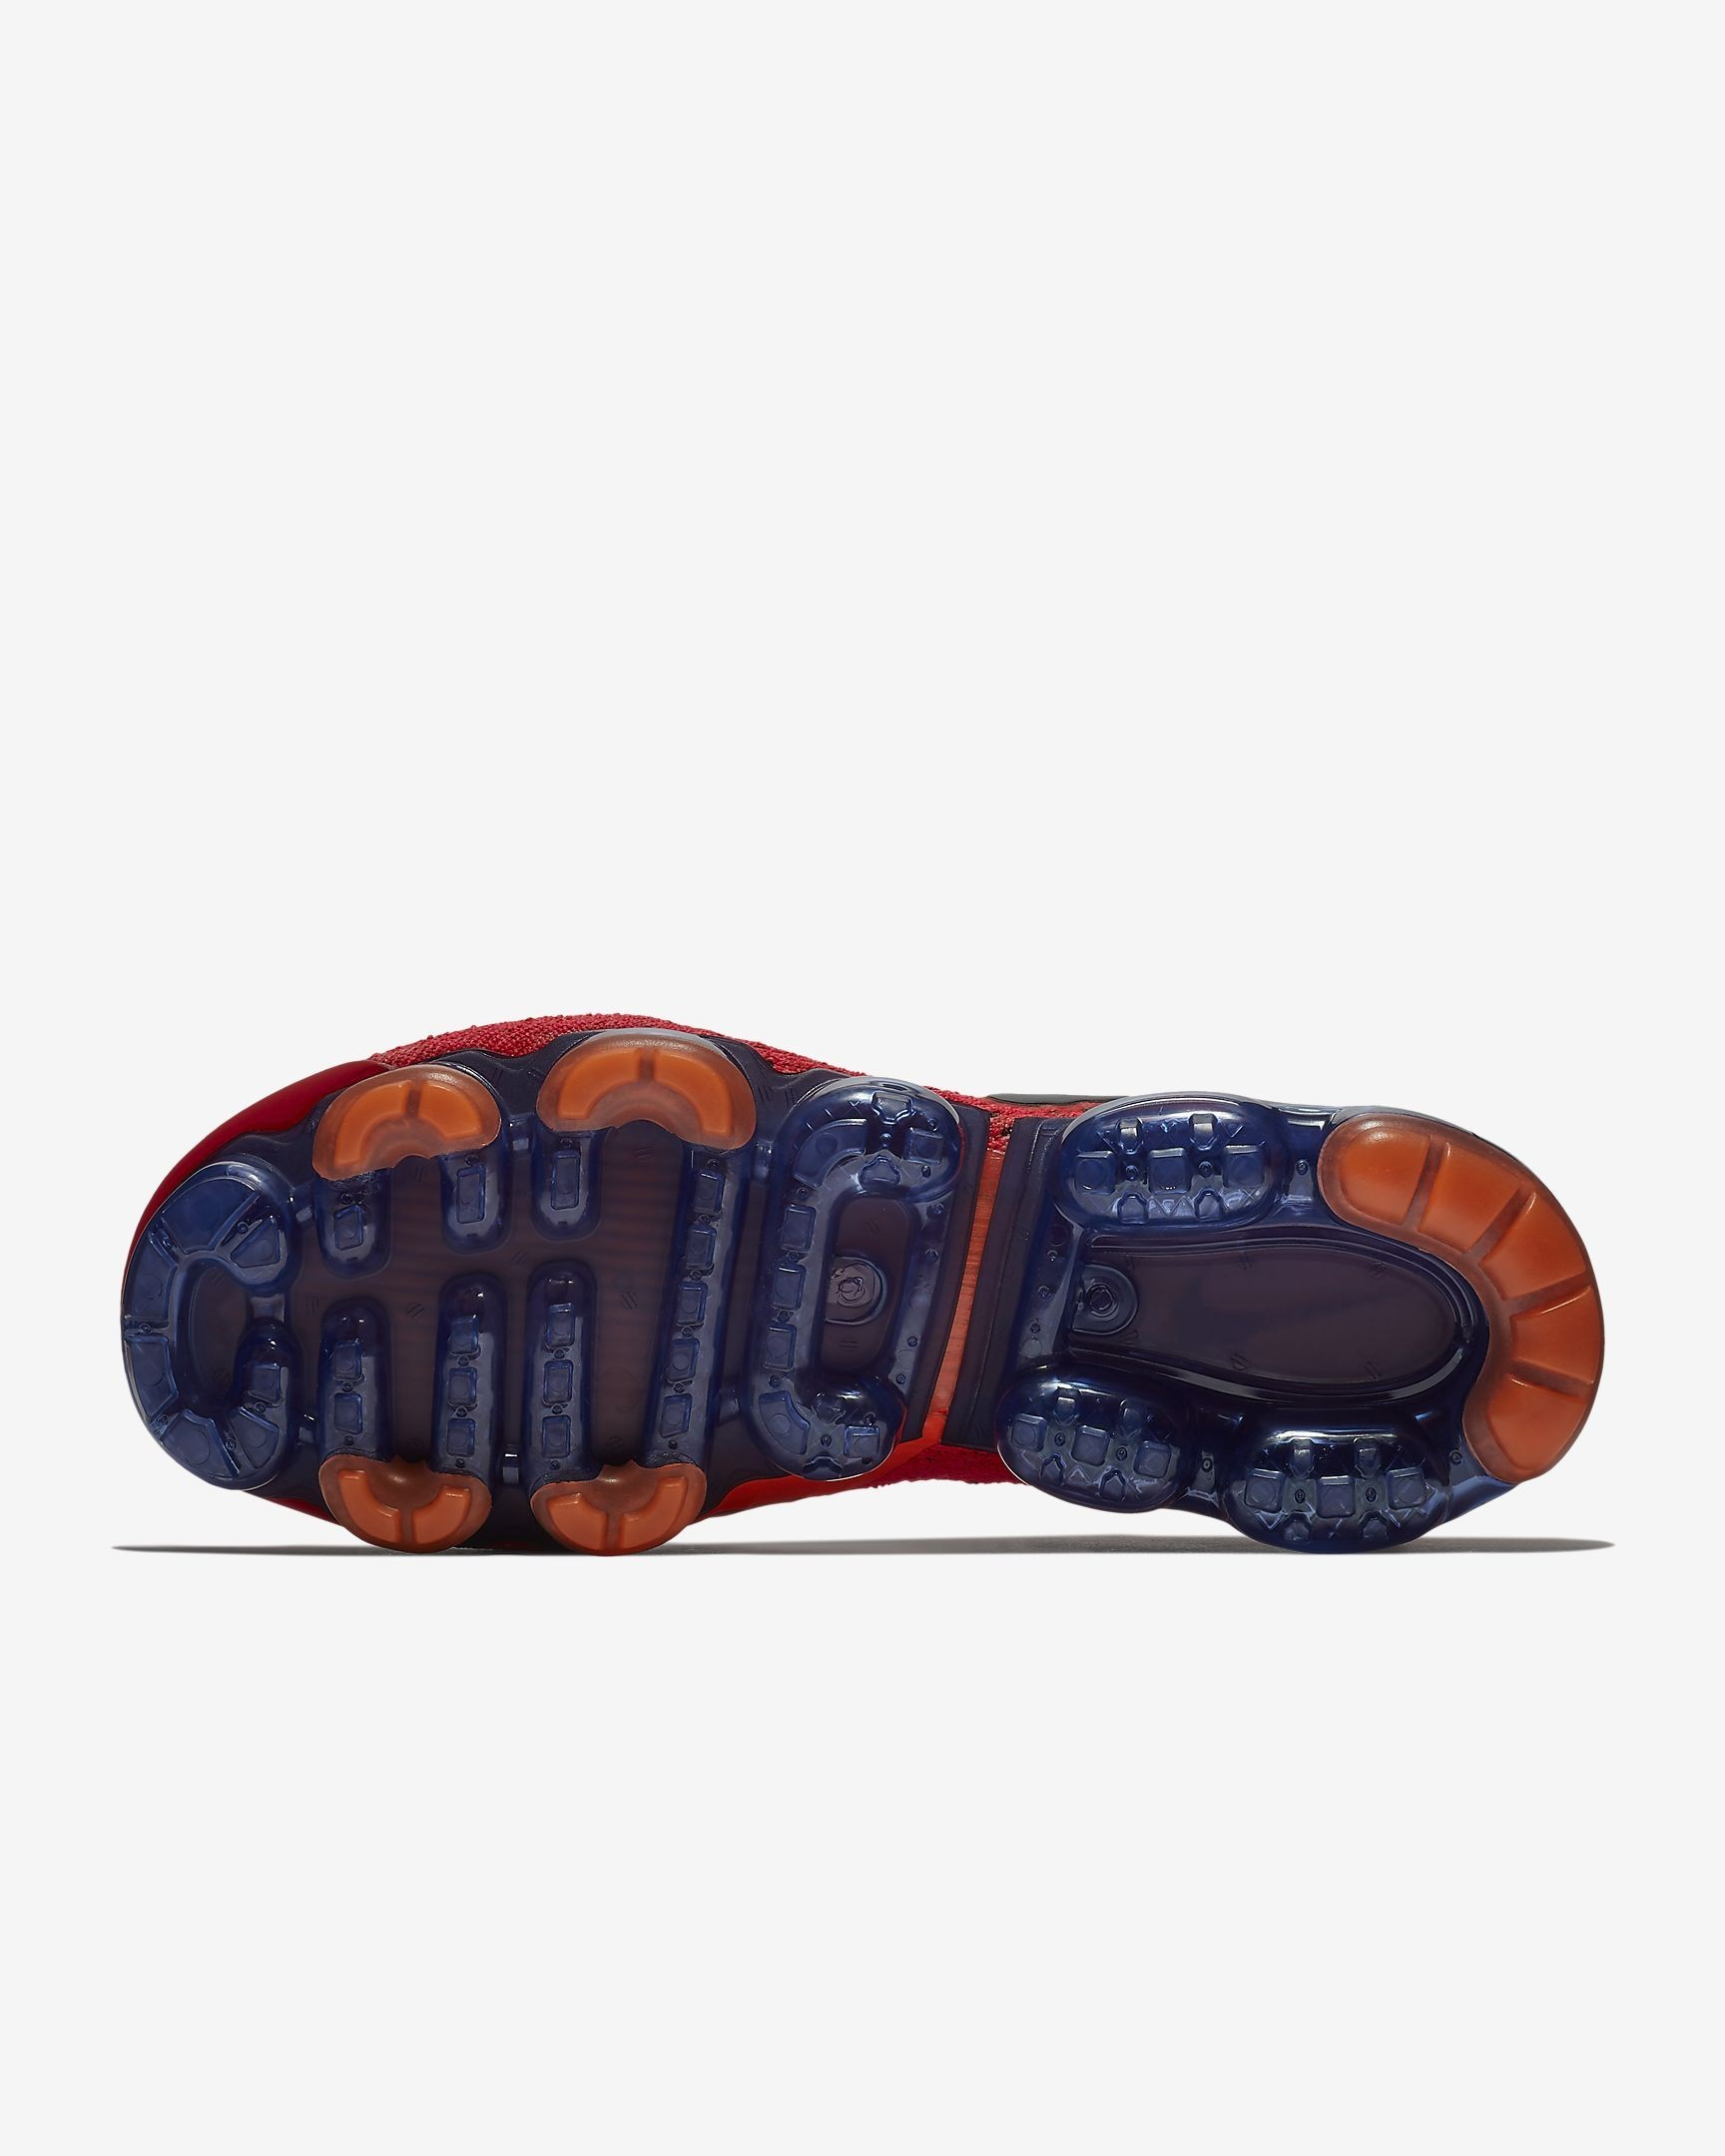 huge discount f5ebc b5eb1 ... Herren Rot Orbit Gesamt Orange Chile Rot Obsidian Nike Air VaporMax  Flyknit 2